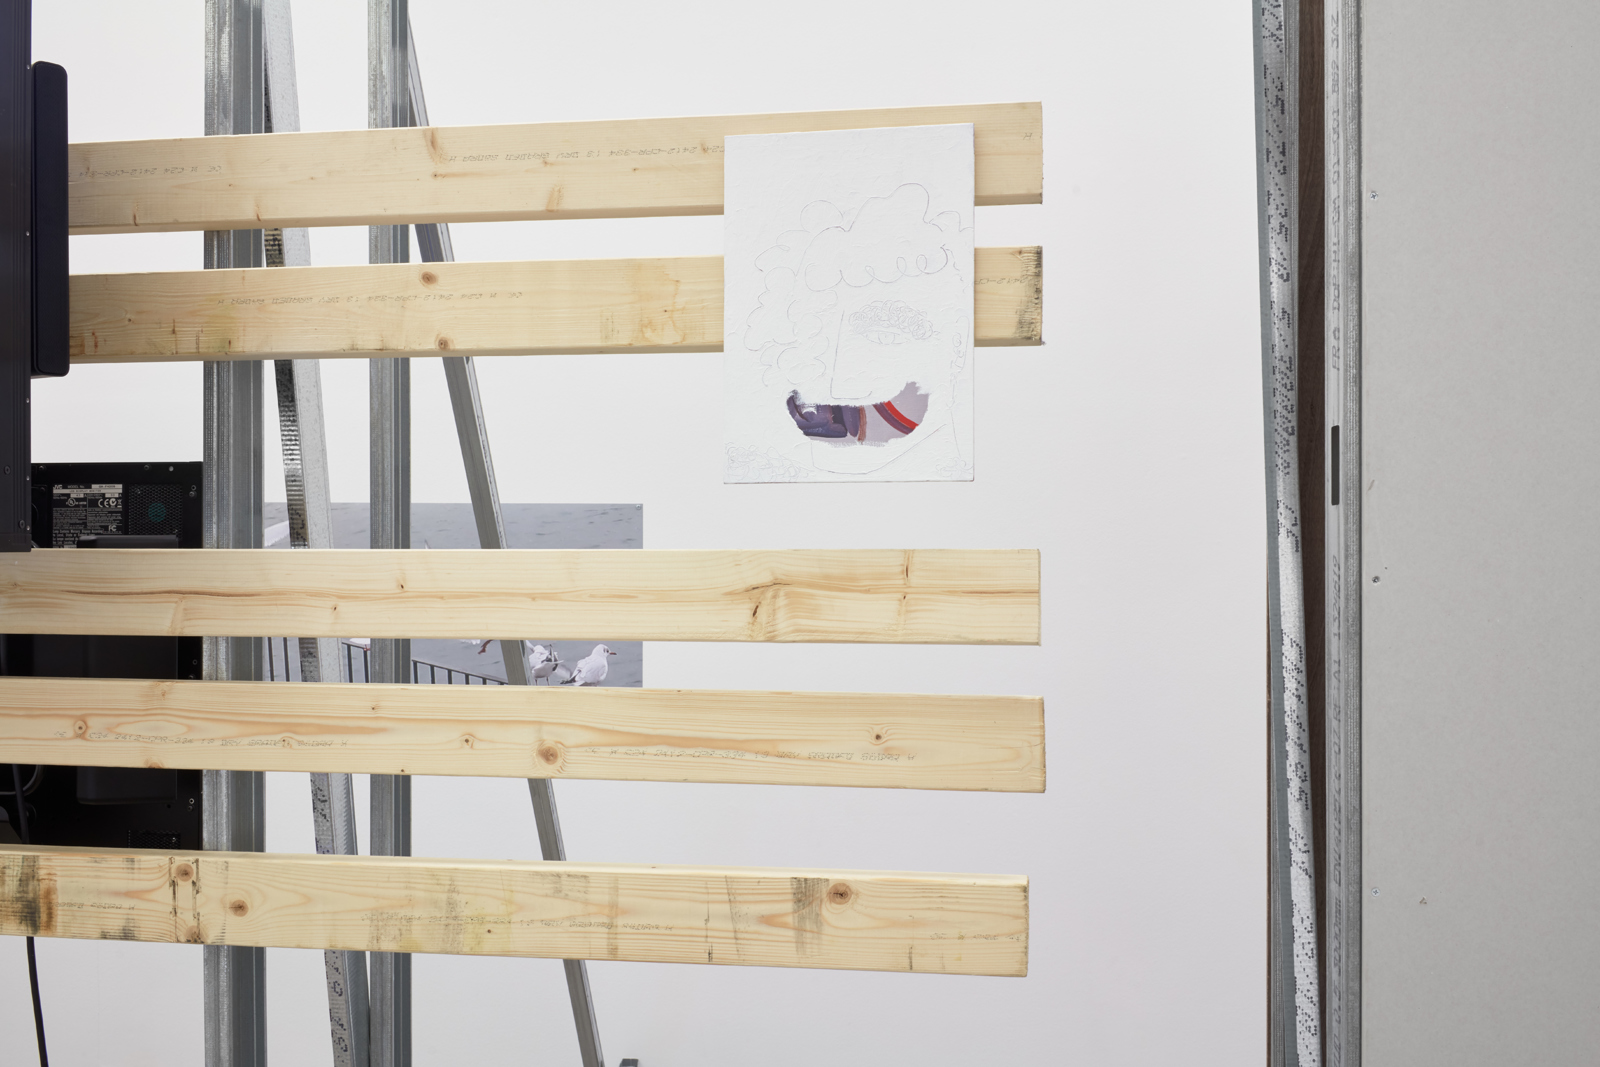 Installation view, Hilary Lloyd, Car Park, Sadie Coles HQ, London, 21 November – 20 December 2019 | Image credit: © Hilary Lloyd, courtesy Sadie Coles HQ, London. Photography: Robert Glowacki